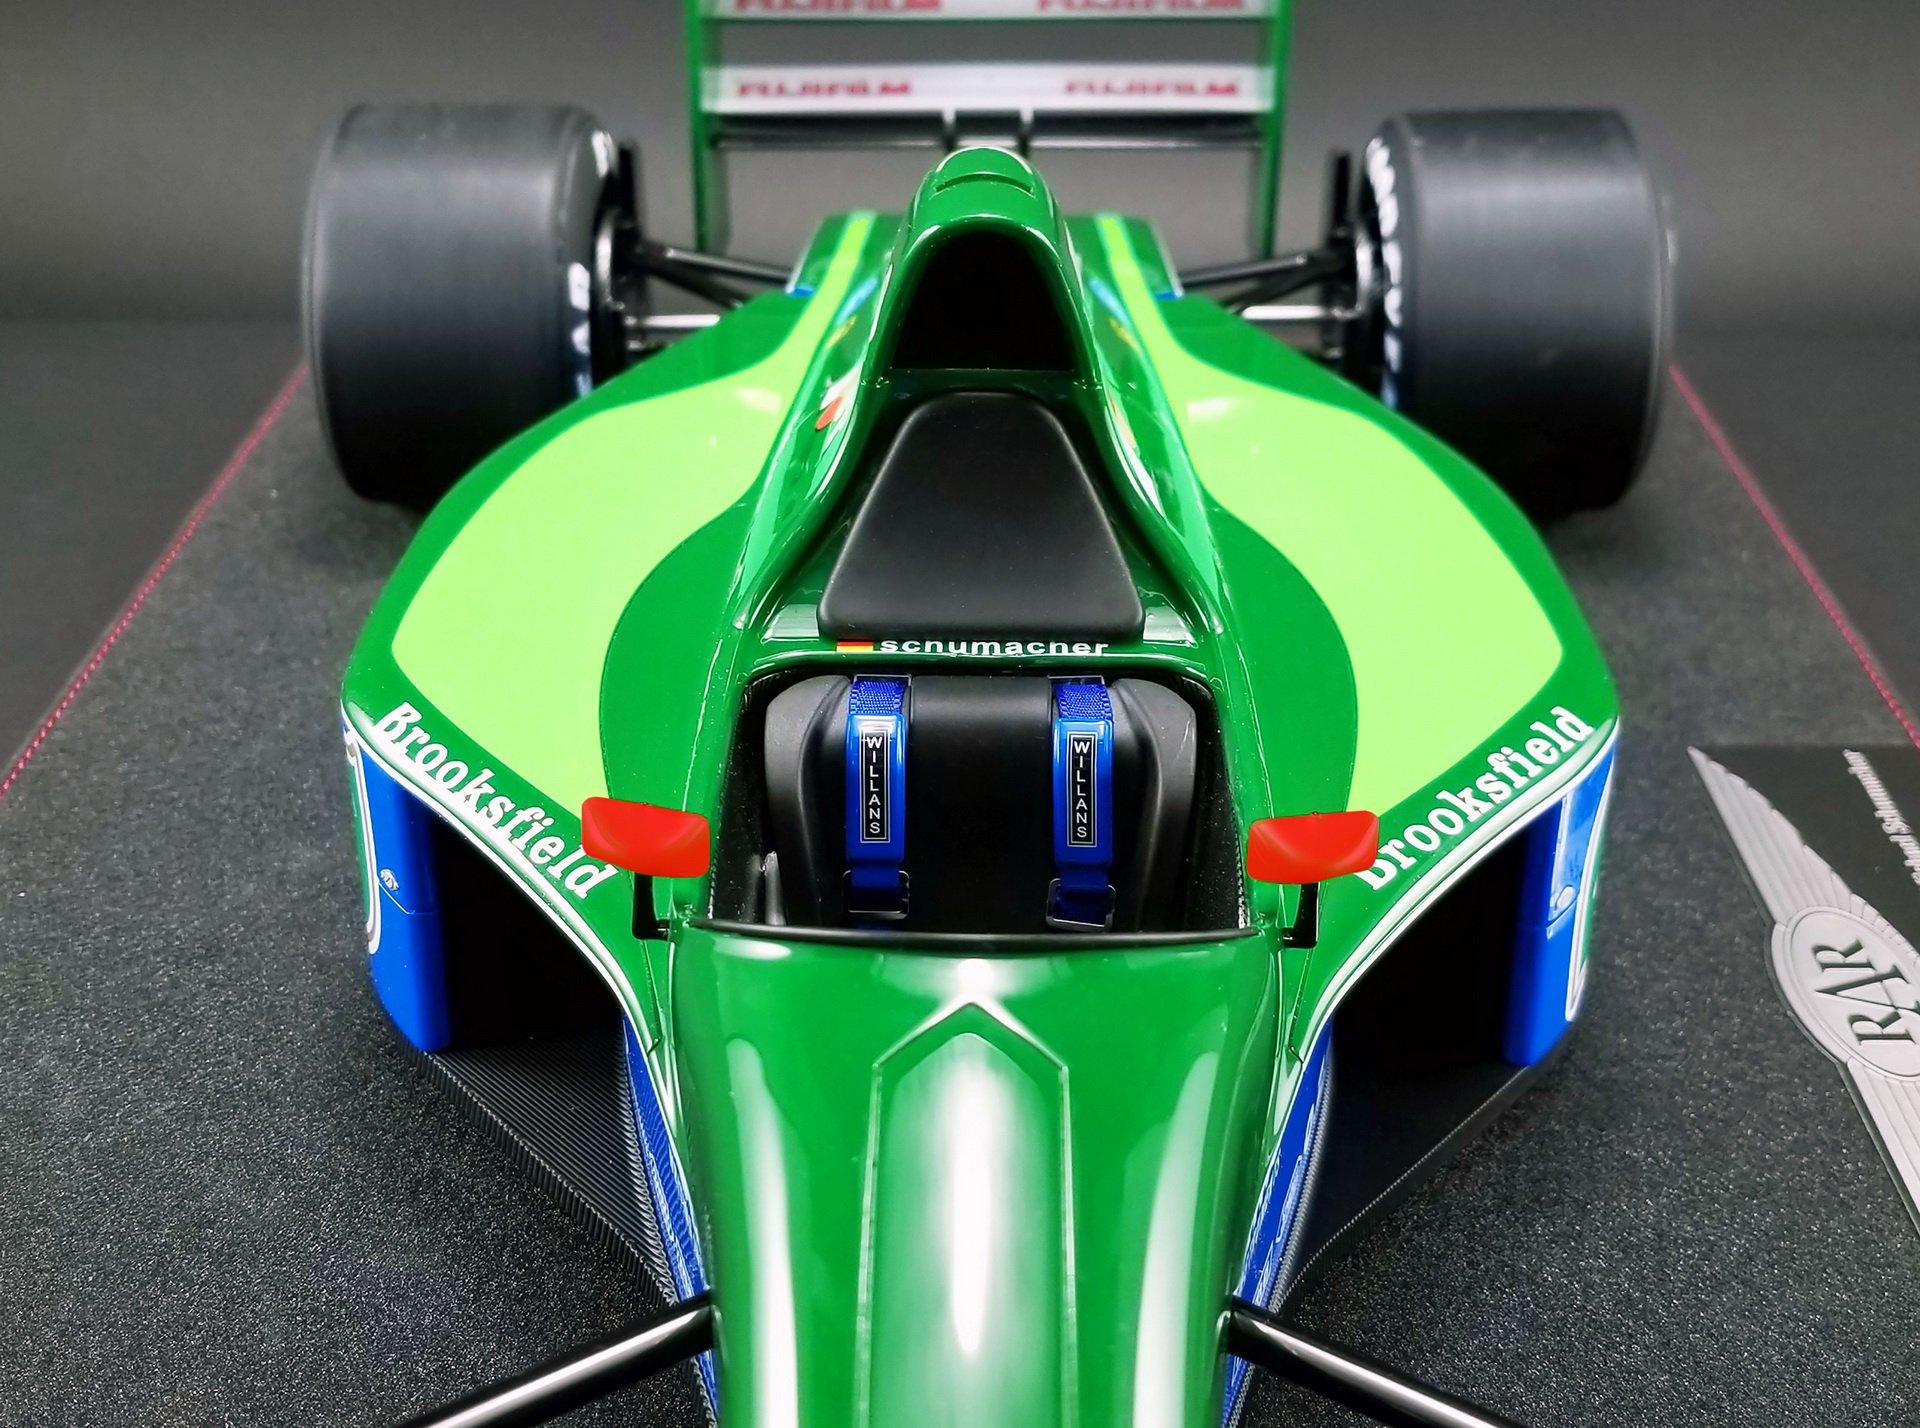 1991_Jordan_F1_car_Schumacher_scale_0008